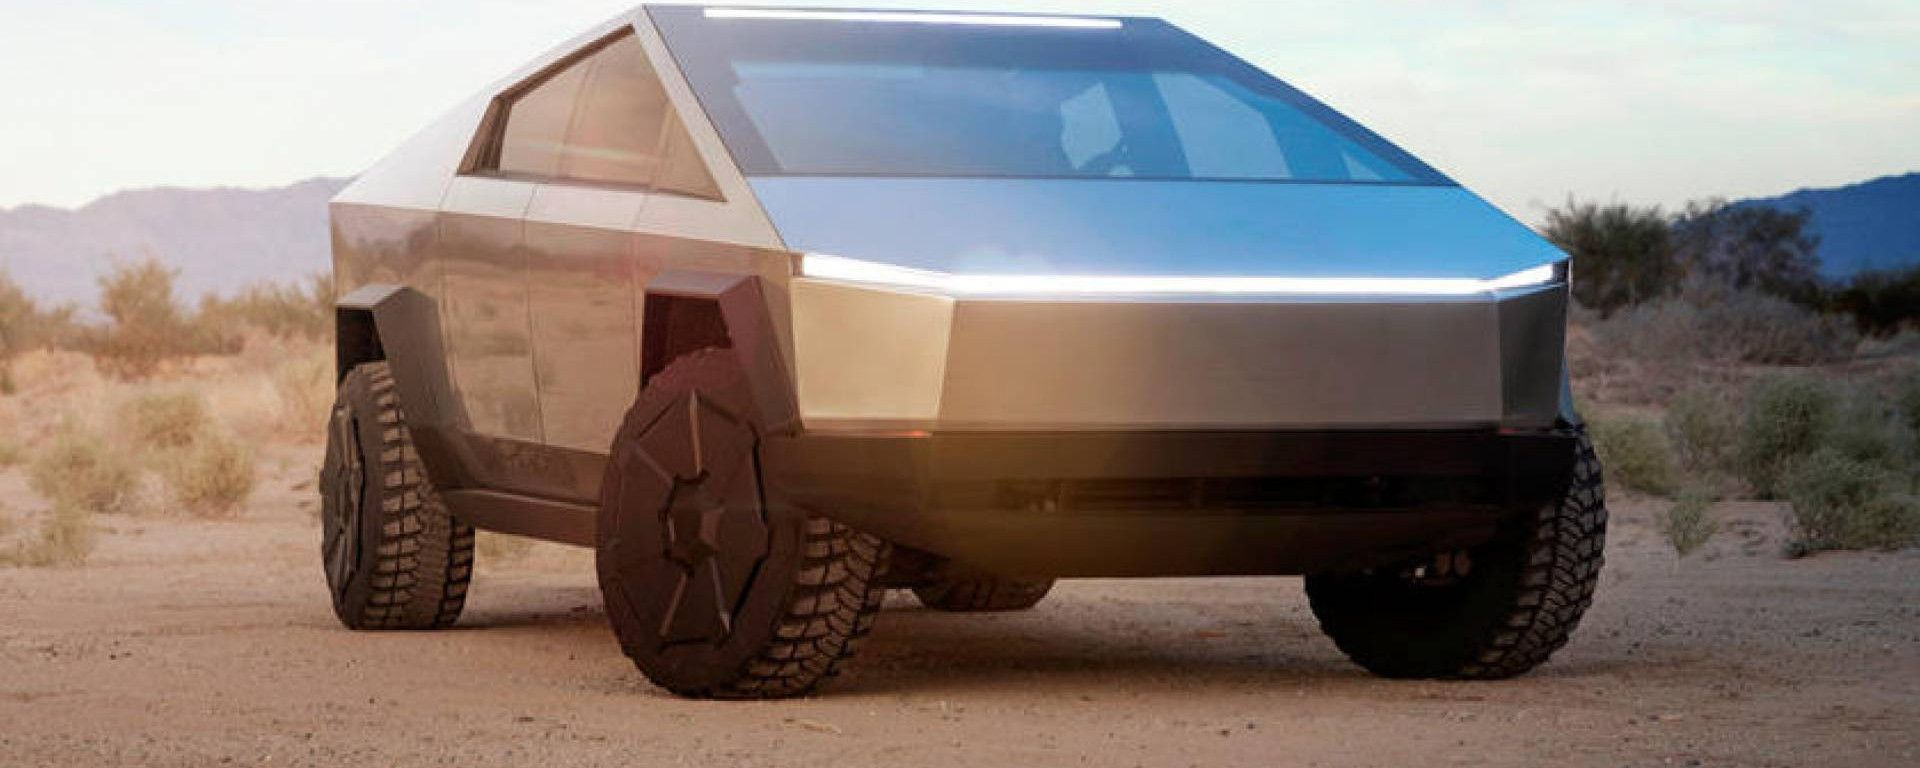 Tesla Cybertruck 2021: per ora niente omologazione europea